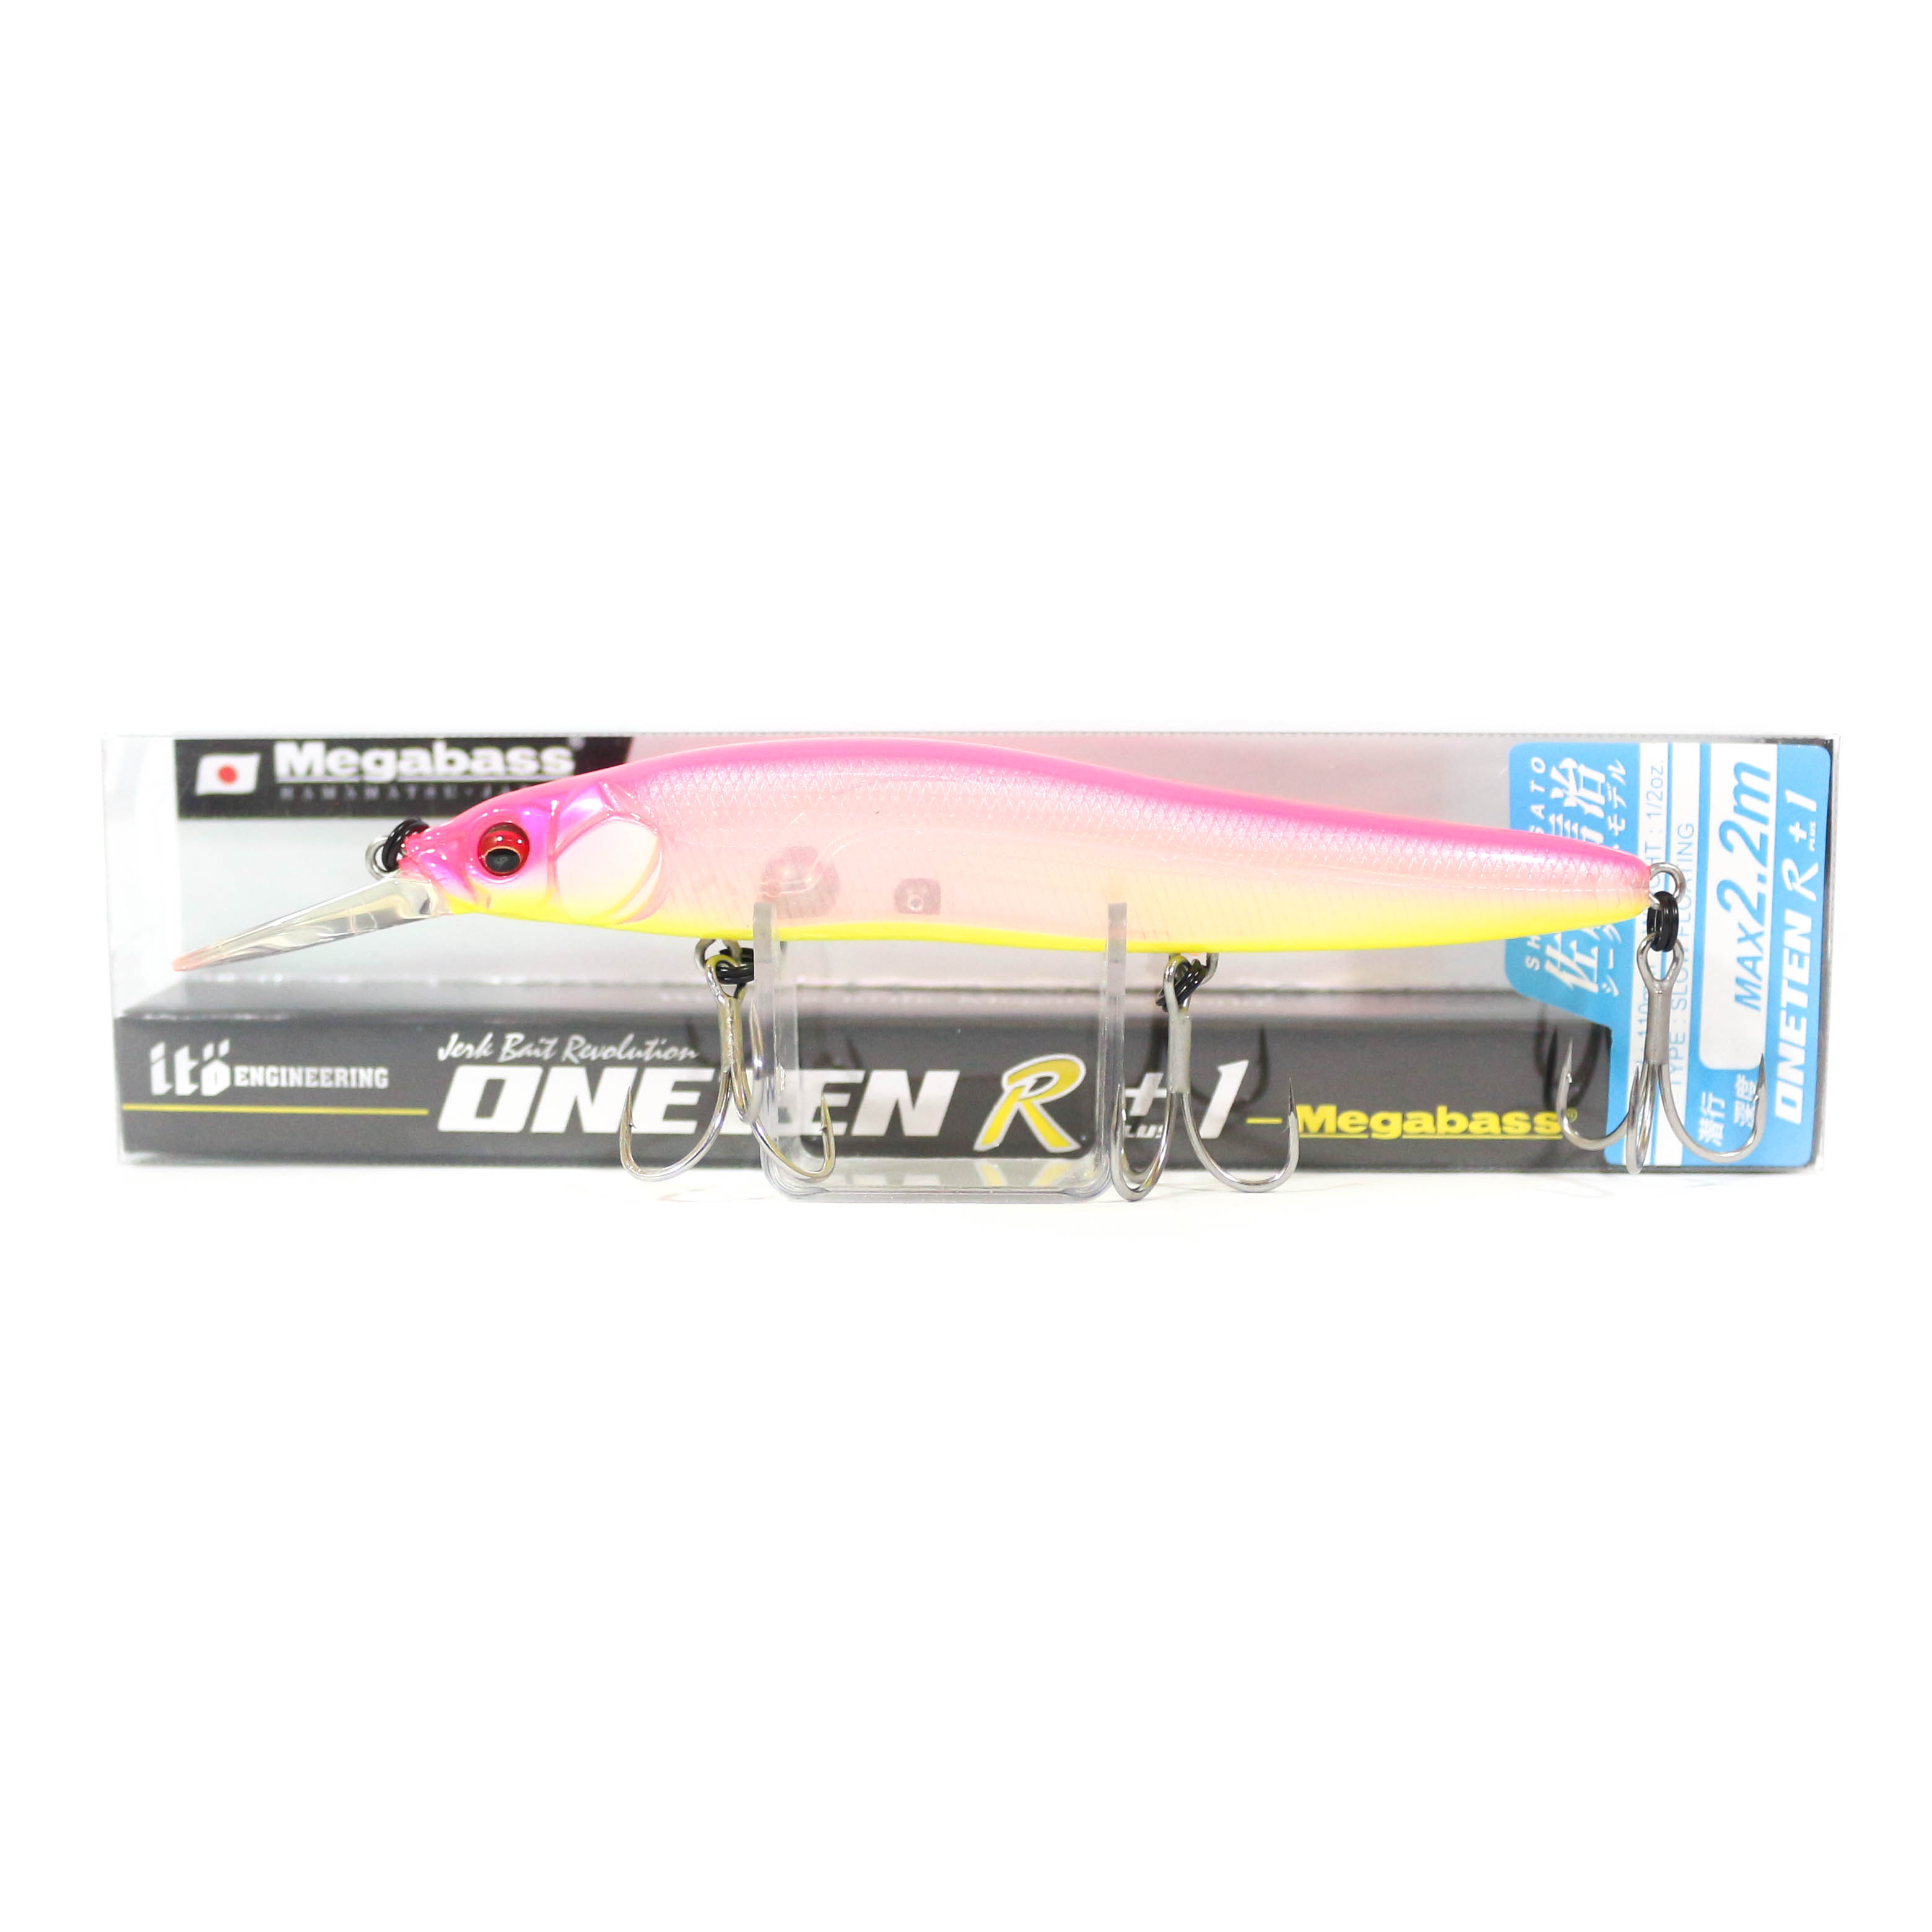 Megabass Vision 110 Oneten R+1 SW Slow Floating Lure Cherry Pink 8534